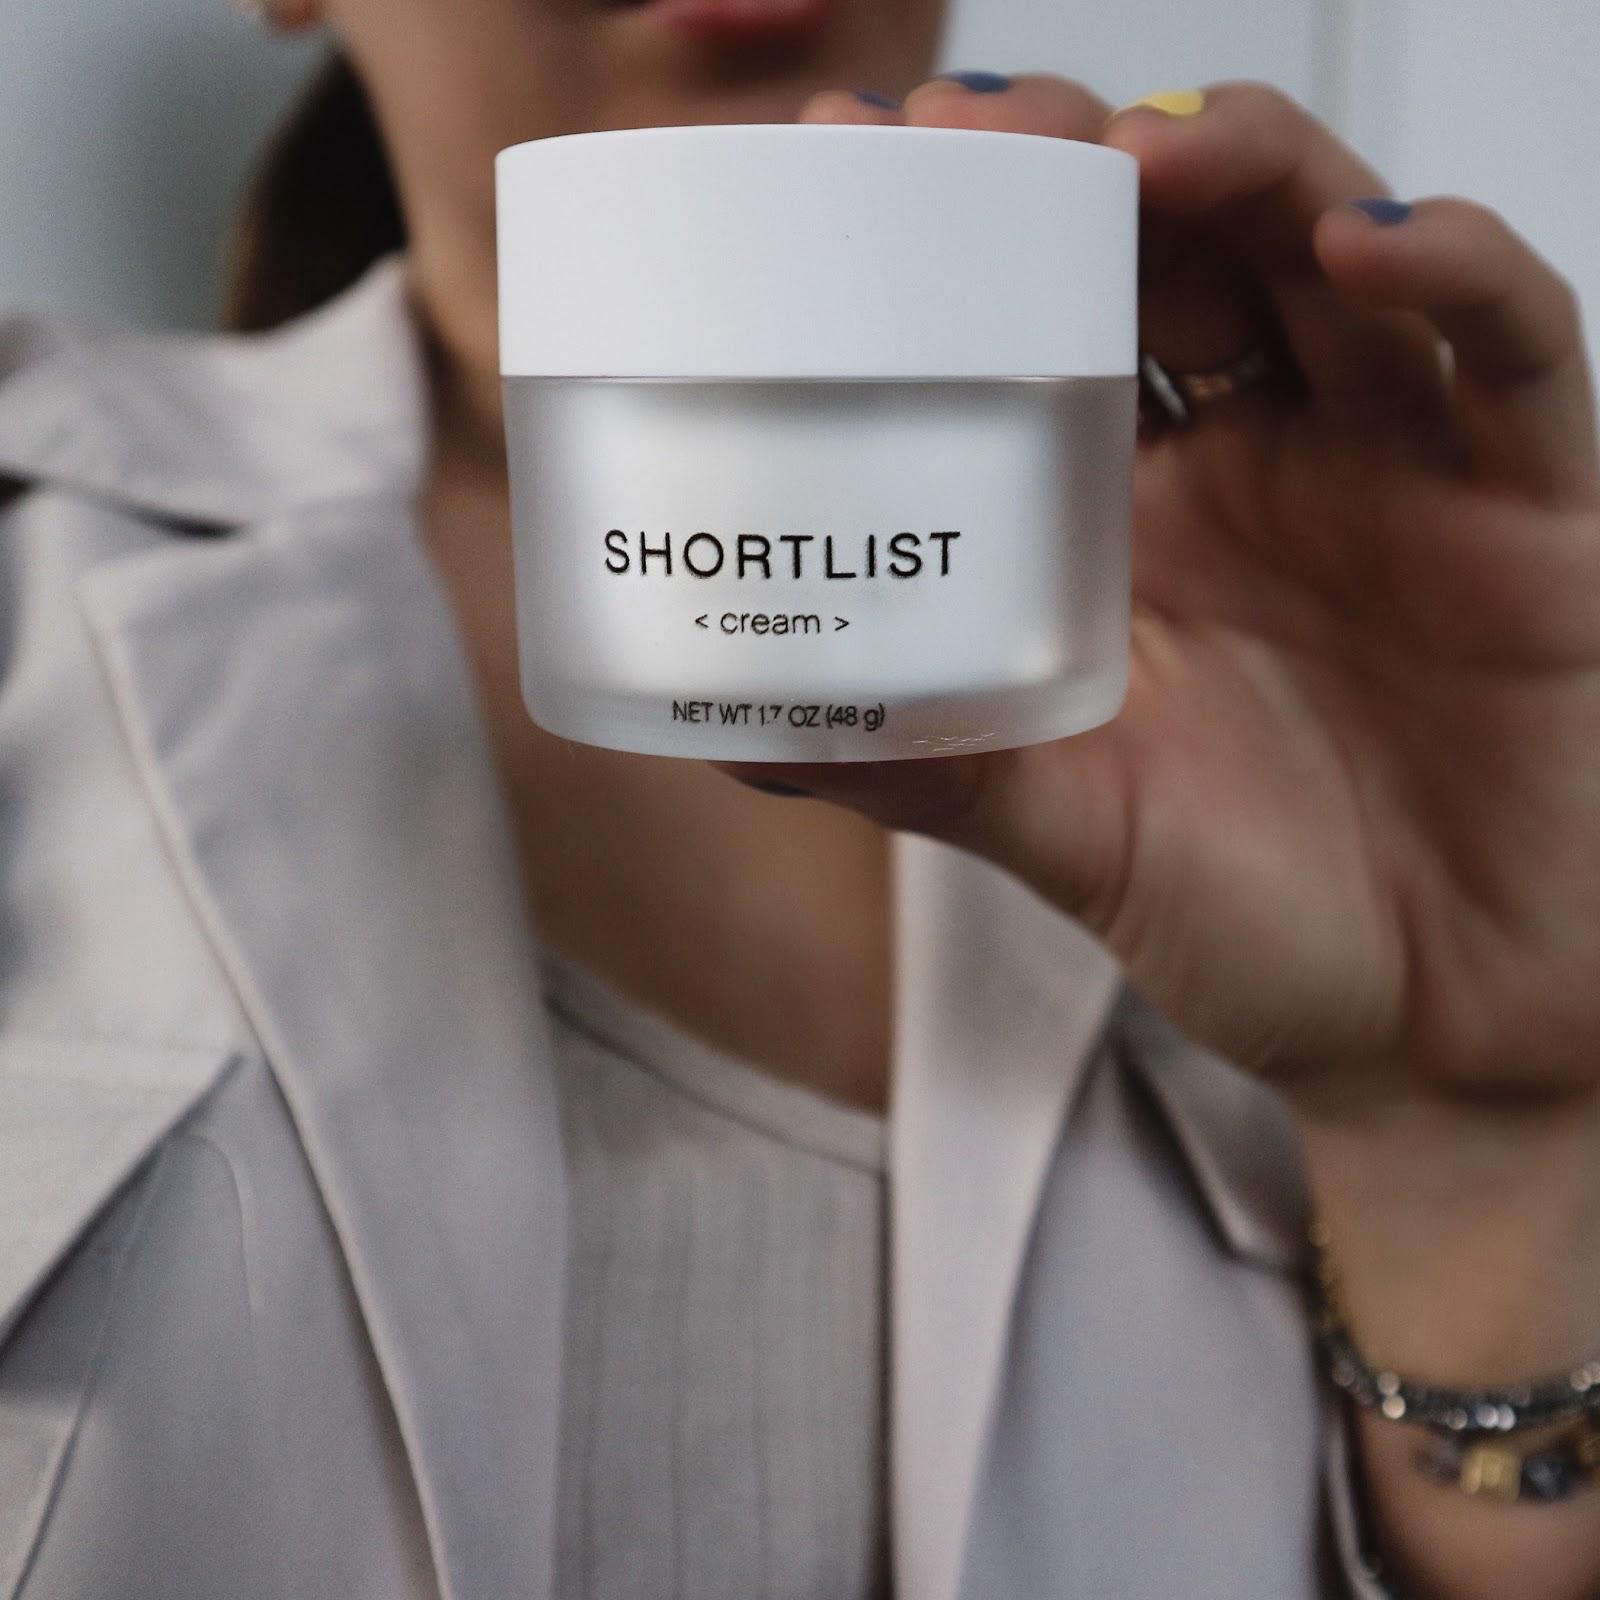 shortlist skincare